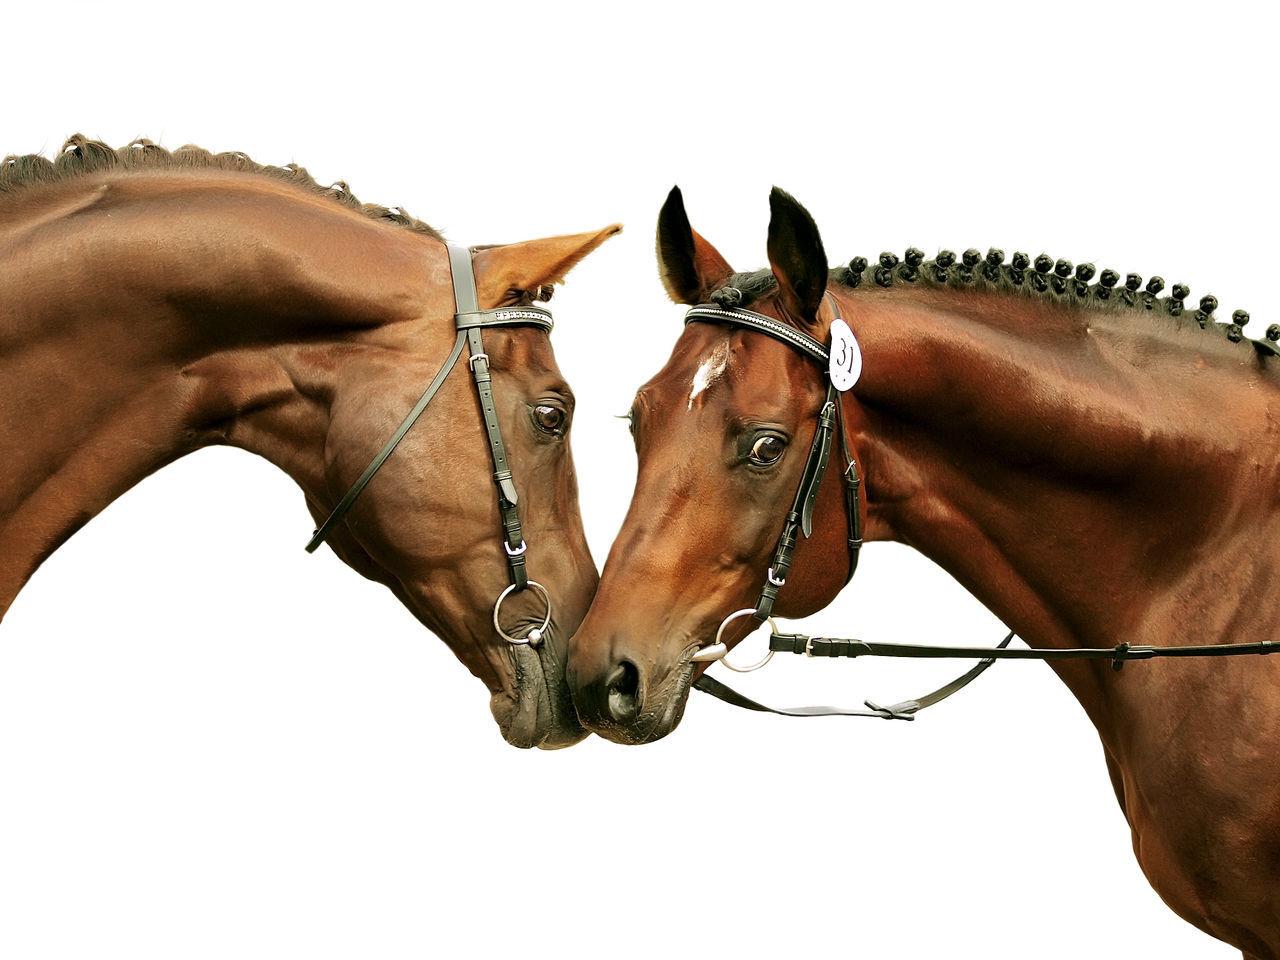 horse, domestic animals, white background, mammal, bridle, brown, livestock, men, human hand, day